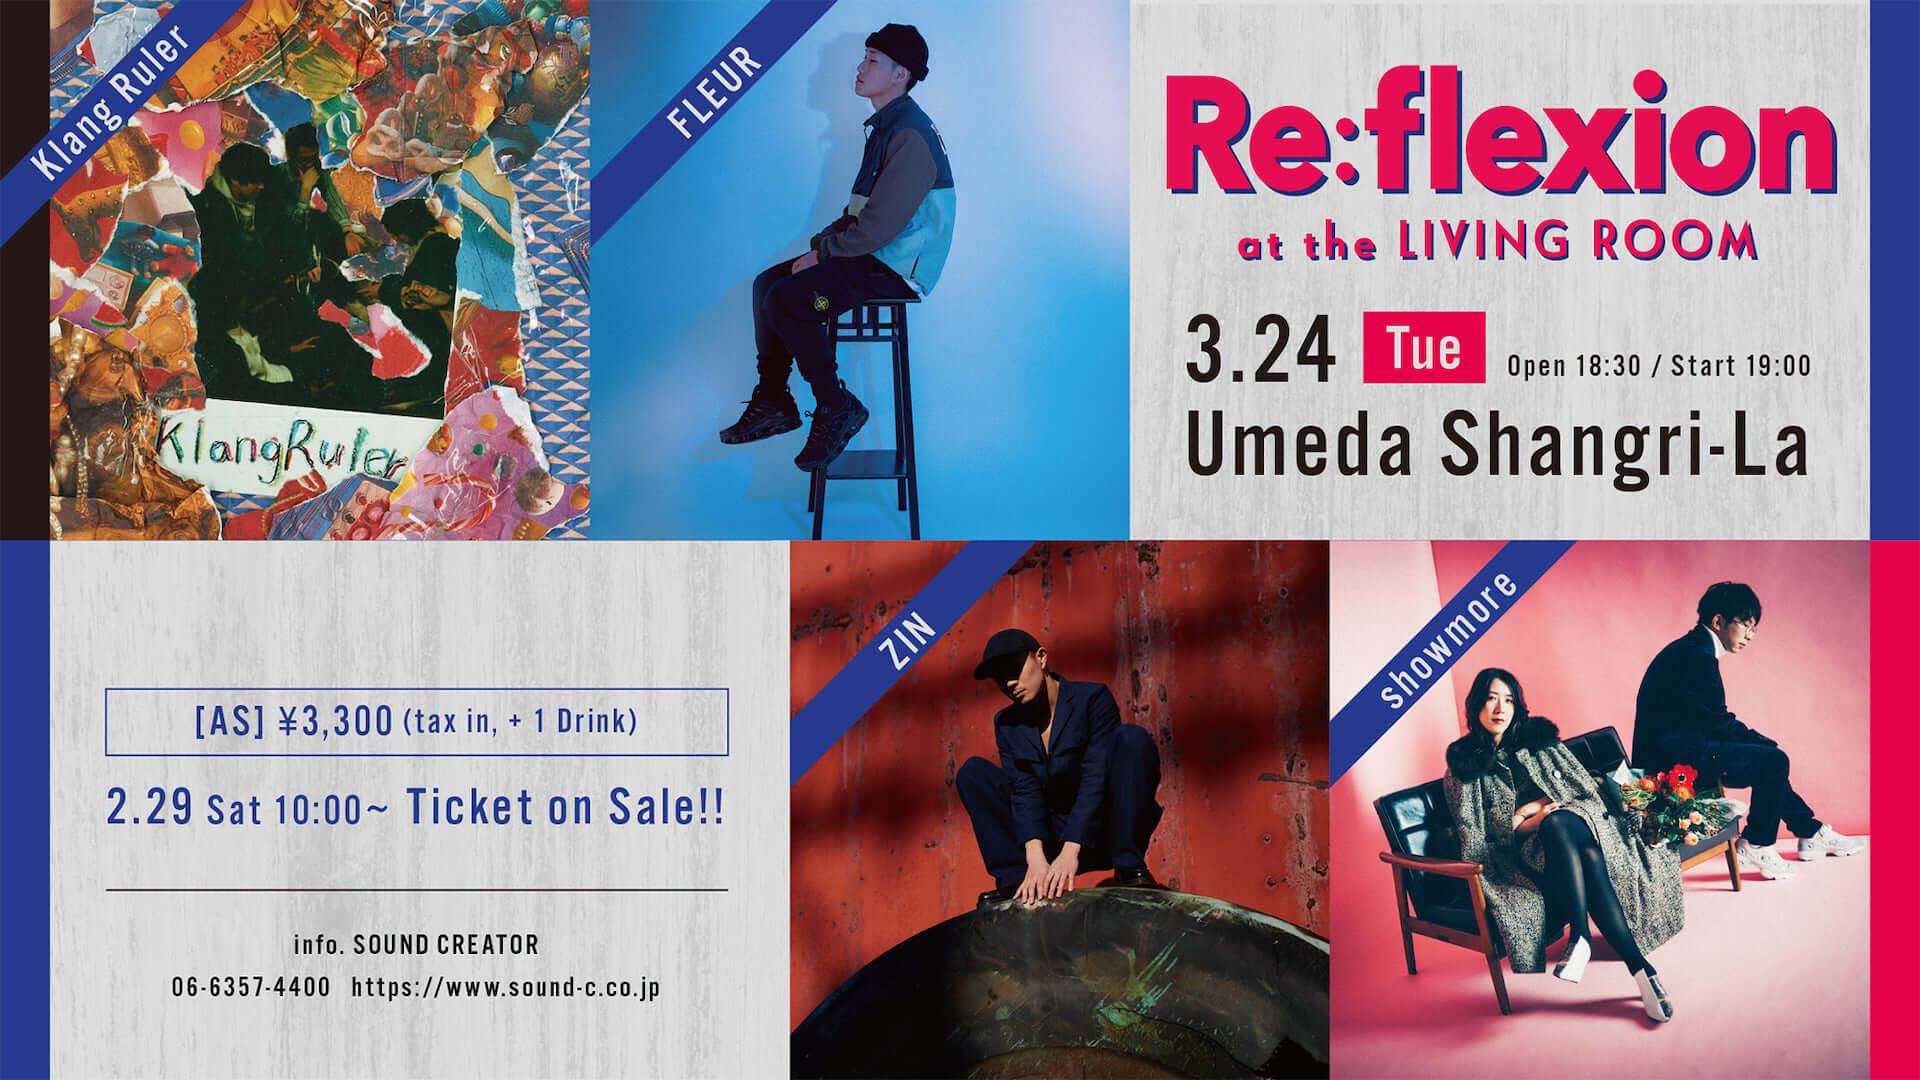 ZIN、showmoreら2020年必見のアーティストが出演|<Re:flexion at the LIVING ROOM>開催決定! music200207_reflexion_main-1920x1080